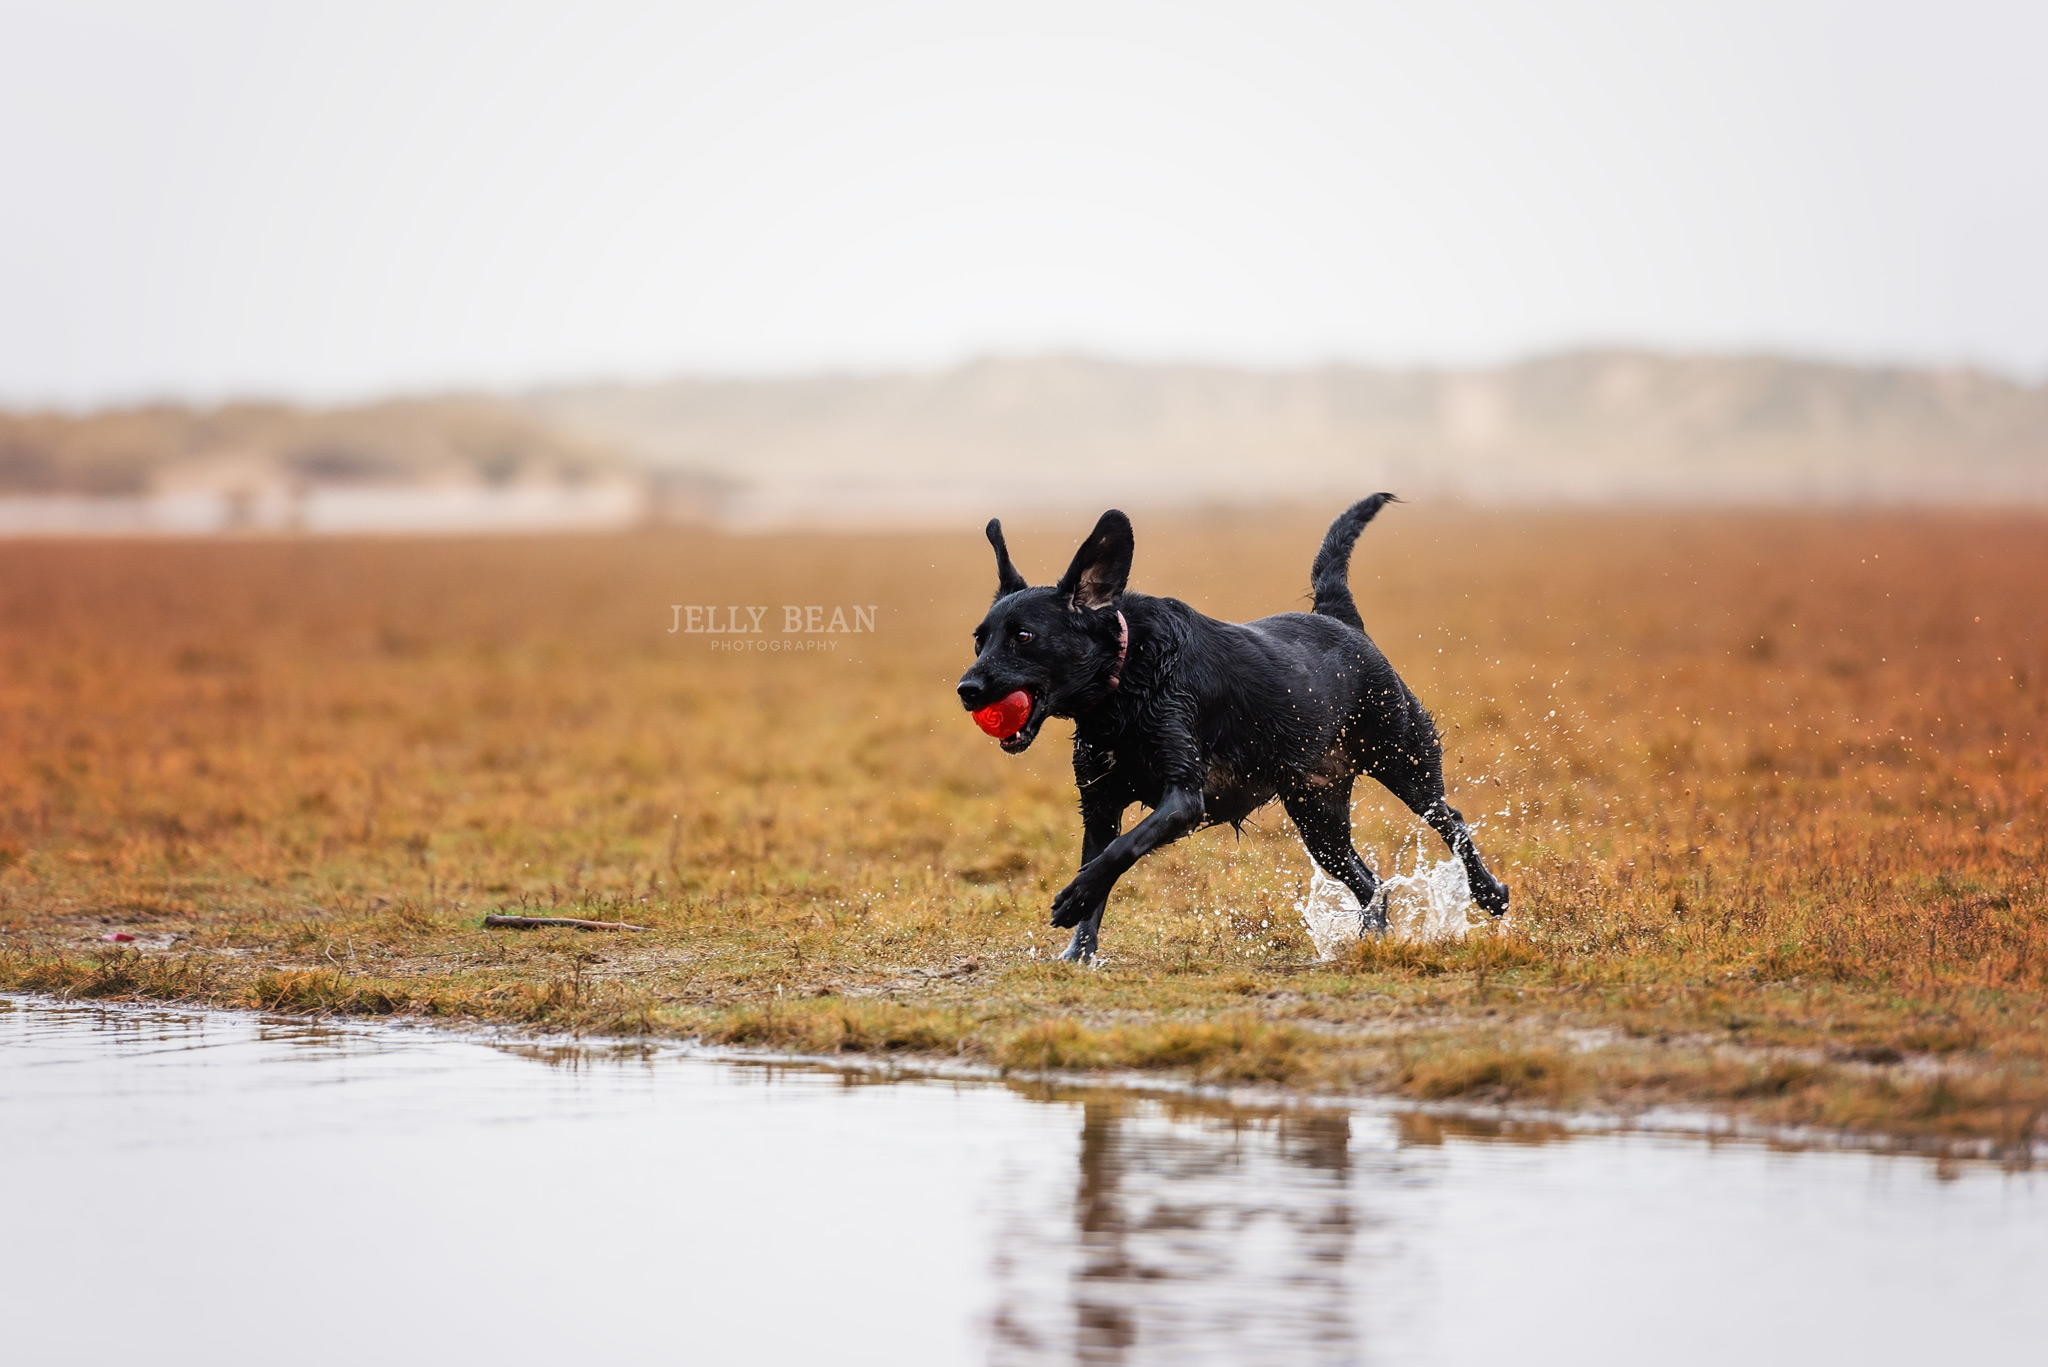 Black labrador running with ball